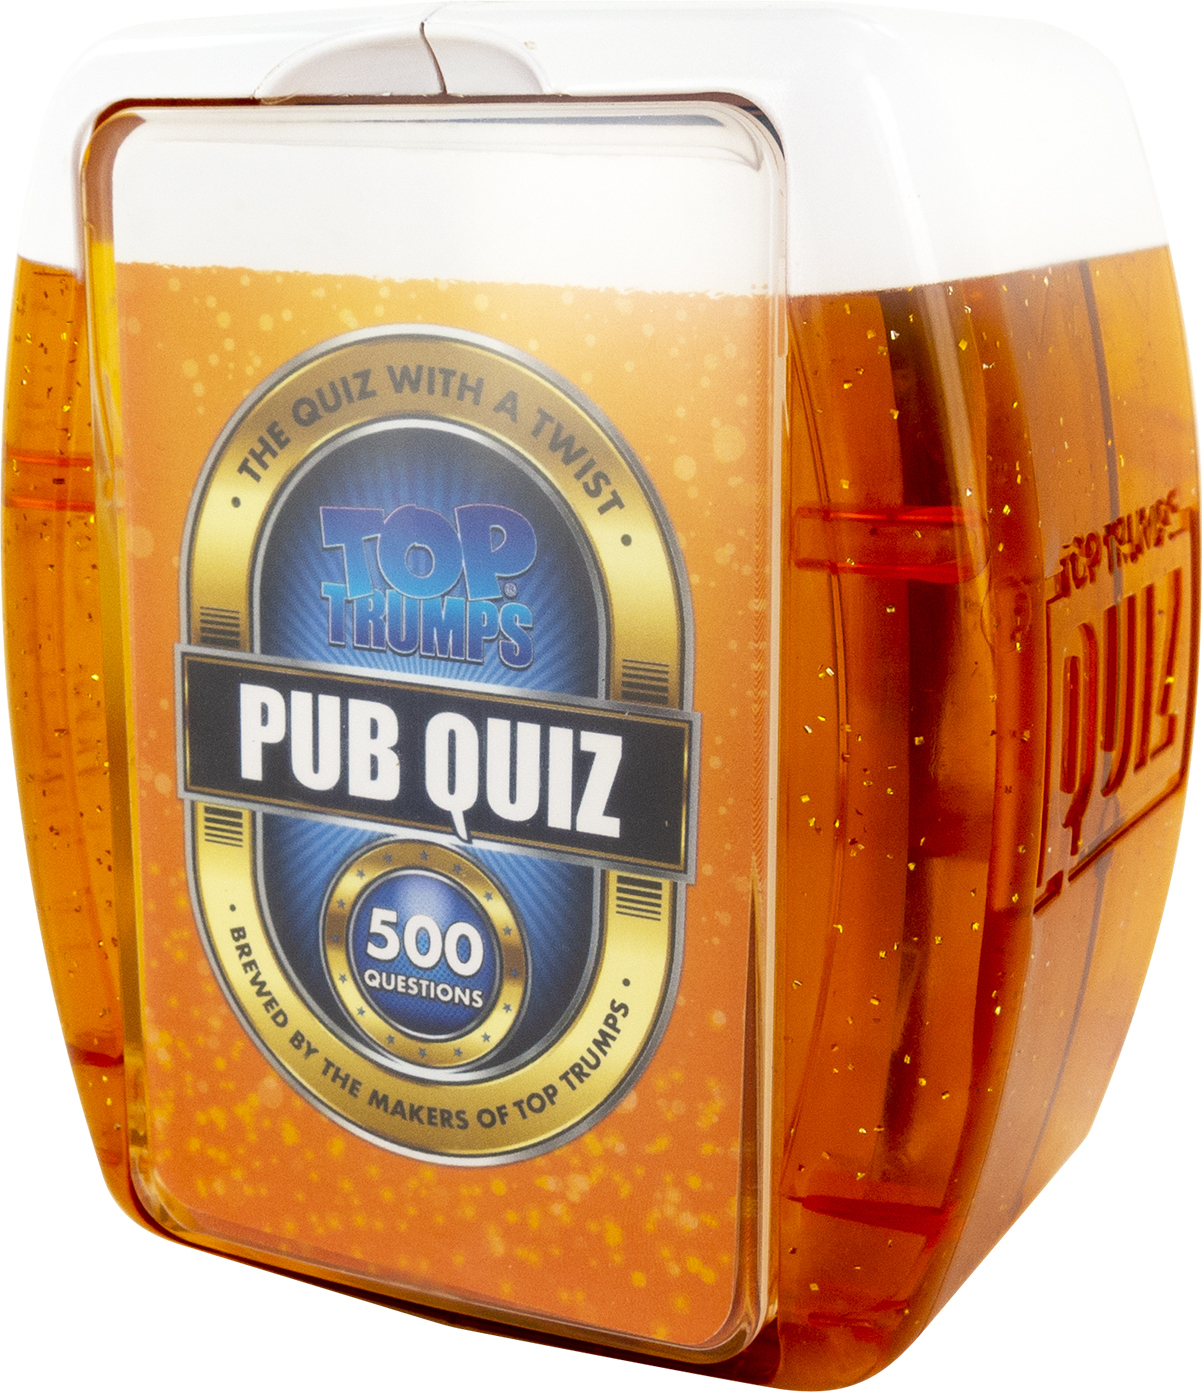 Top Trumps: Pub Quiz image